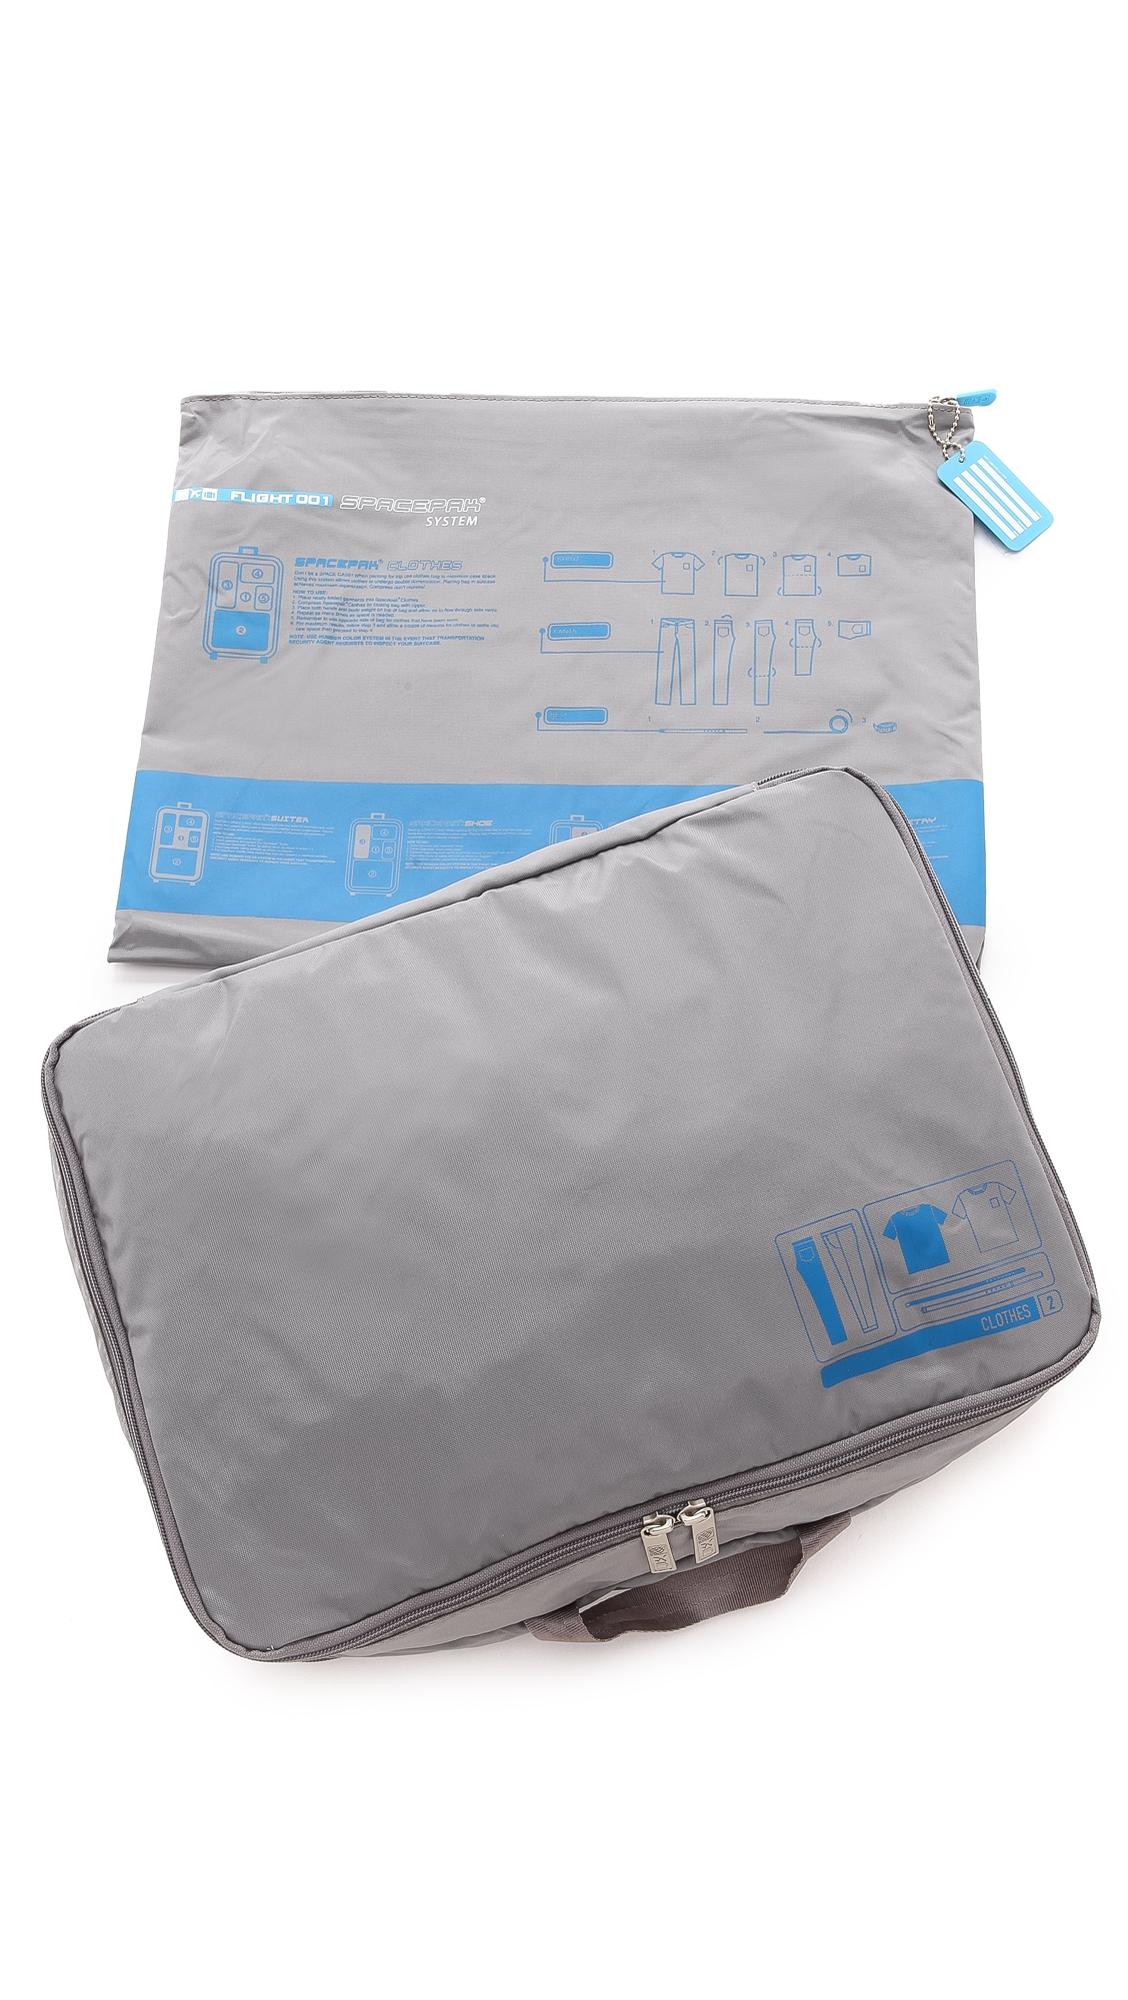 FLIGHT 001 F1 Spacepak Clothes Bag in Grey